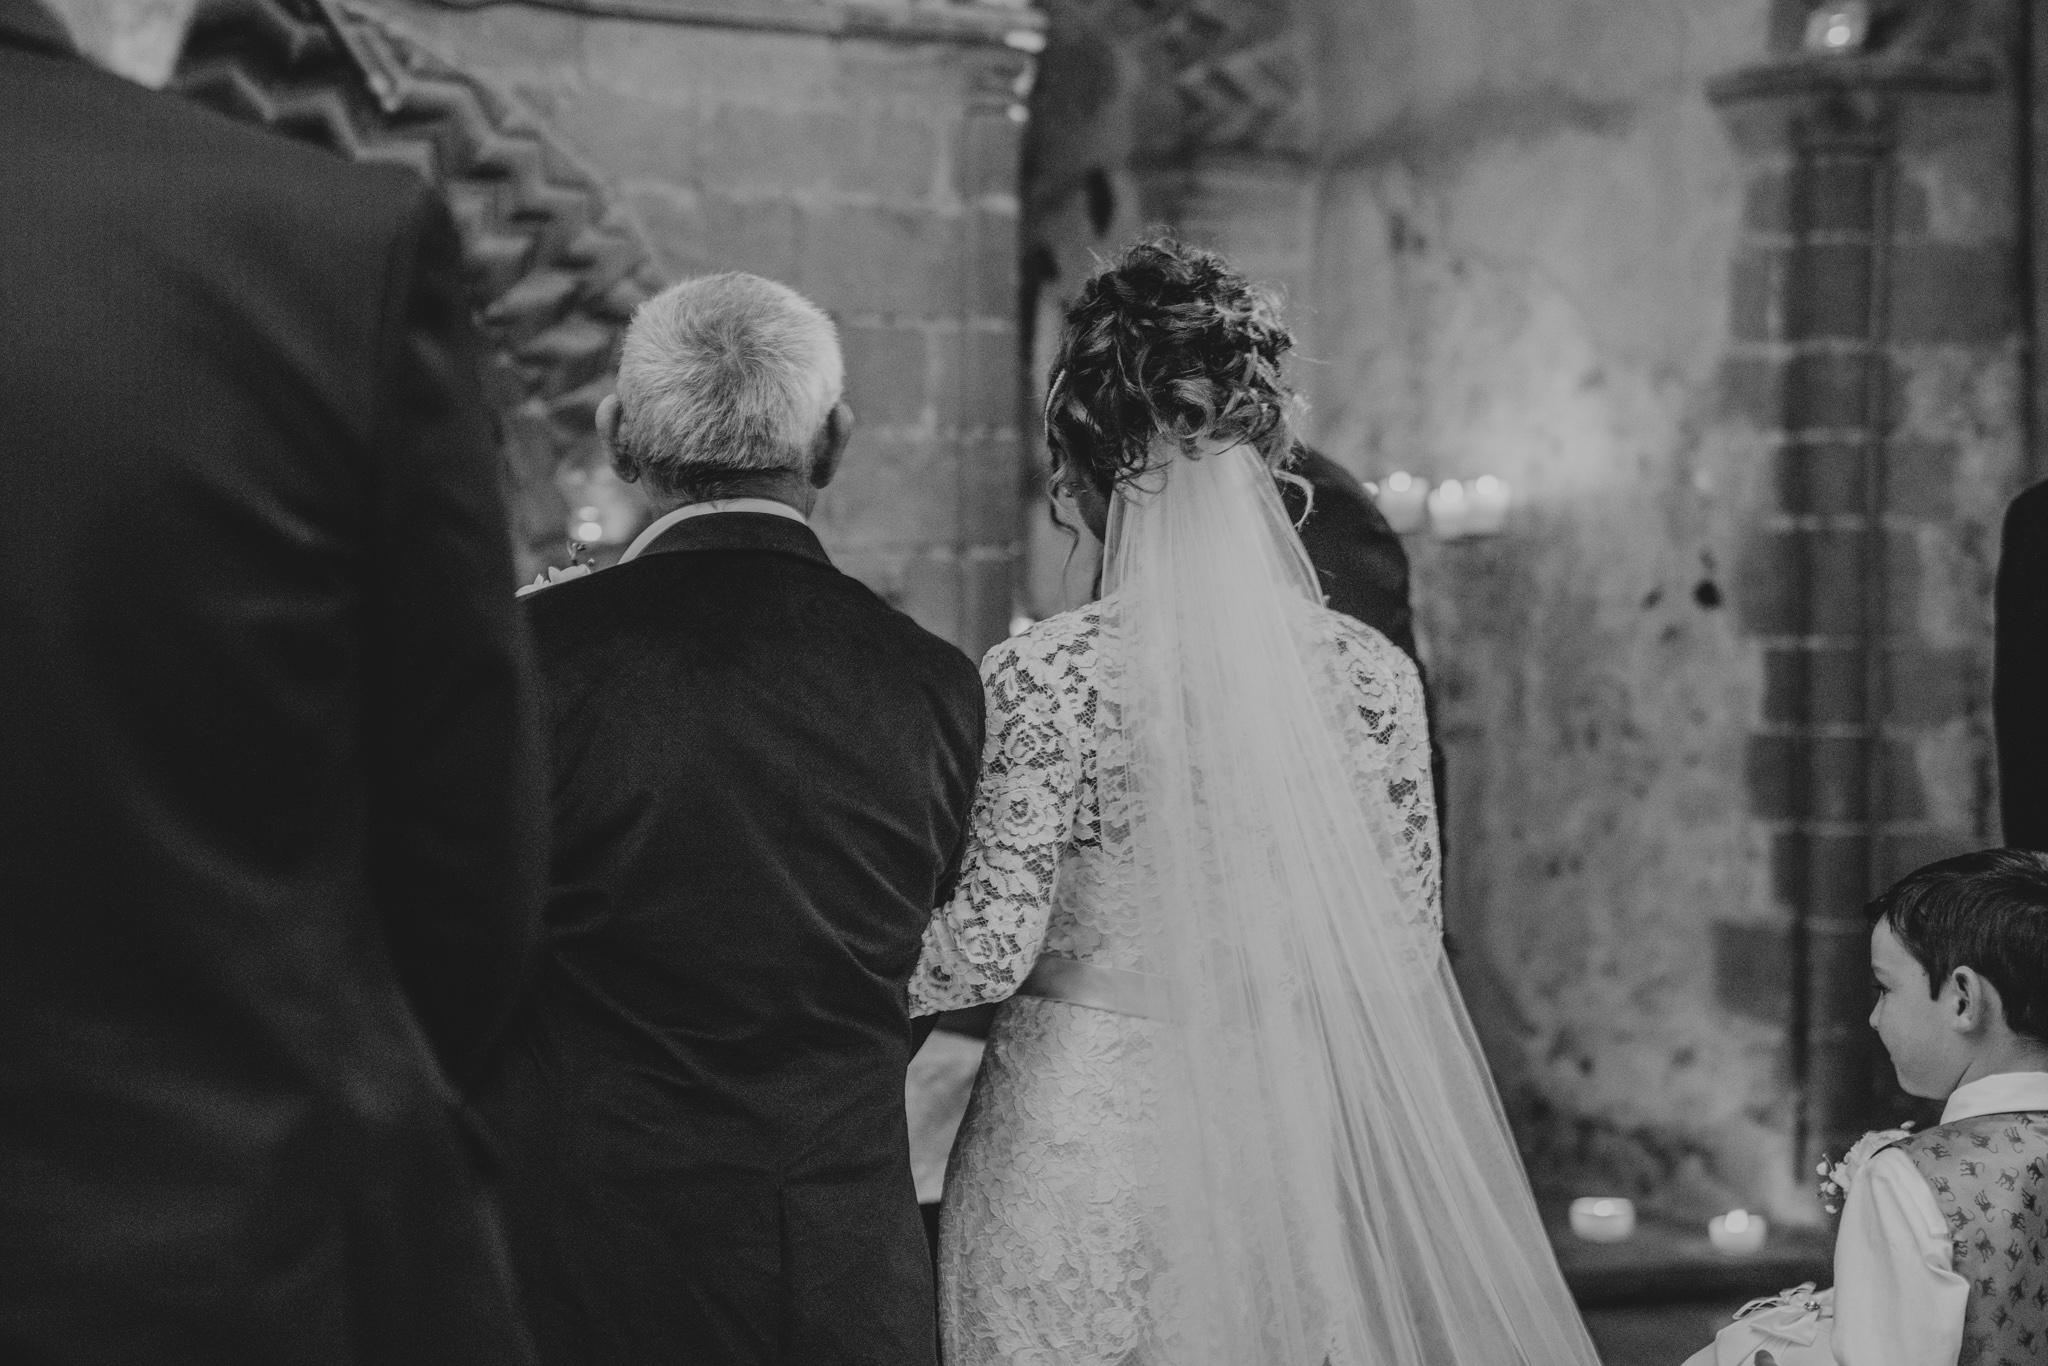 grace-elizabeth-boho-wedding-headingham-castle-essex-wedding-photographer-31.jpg